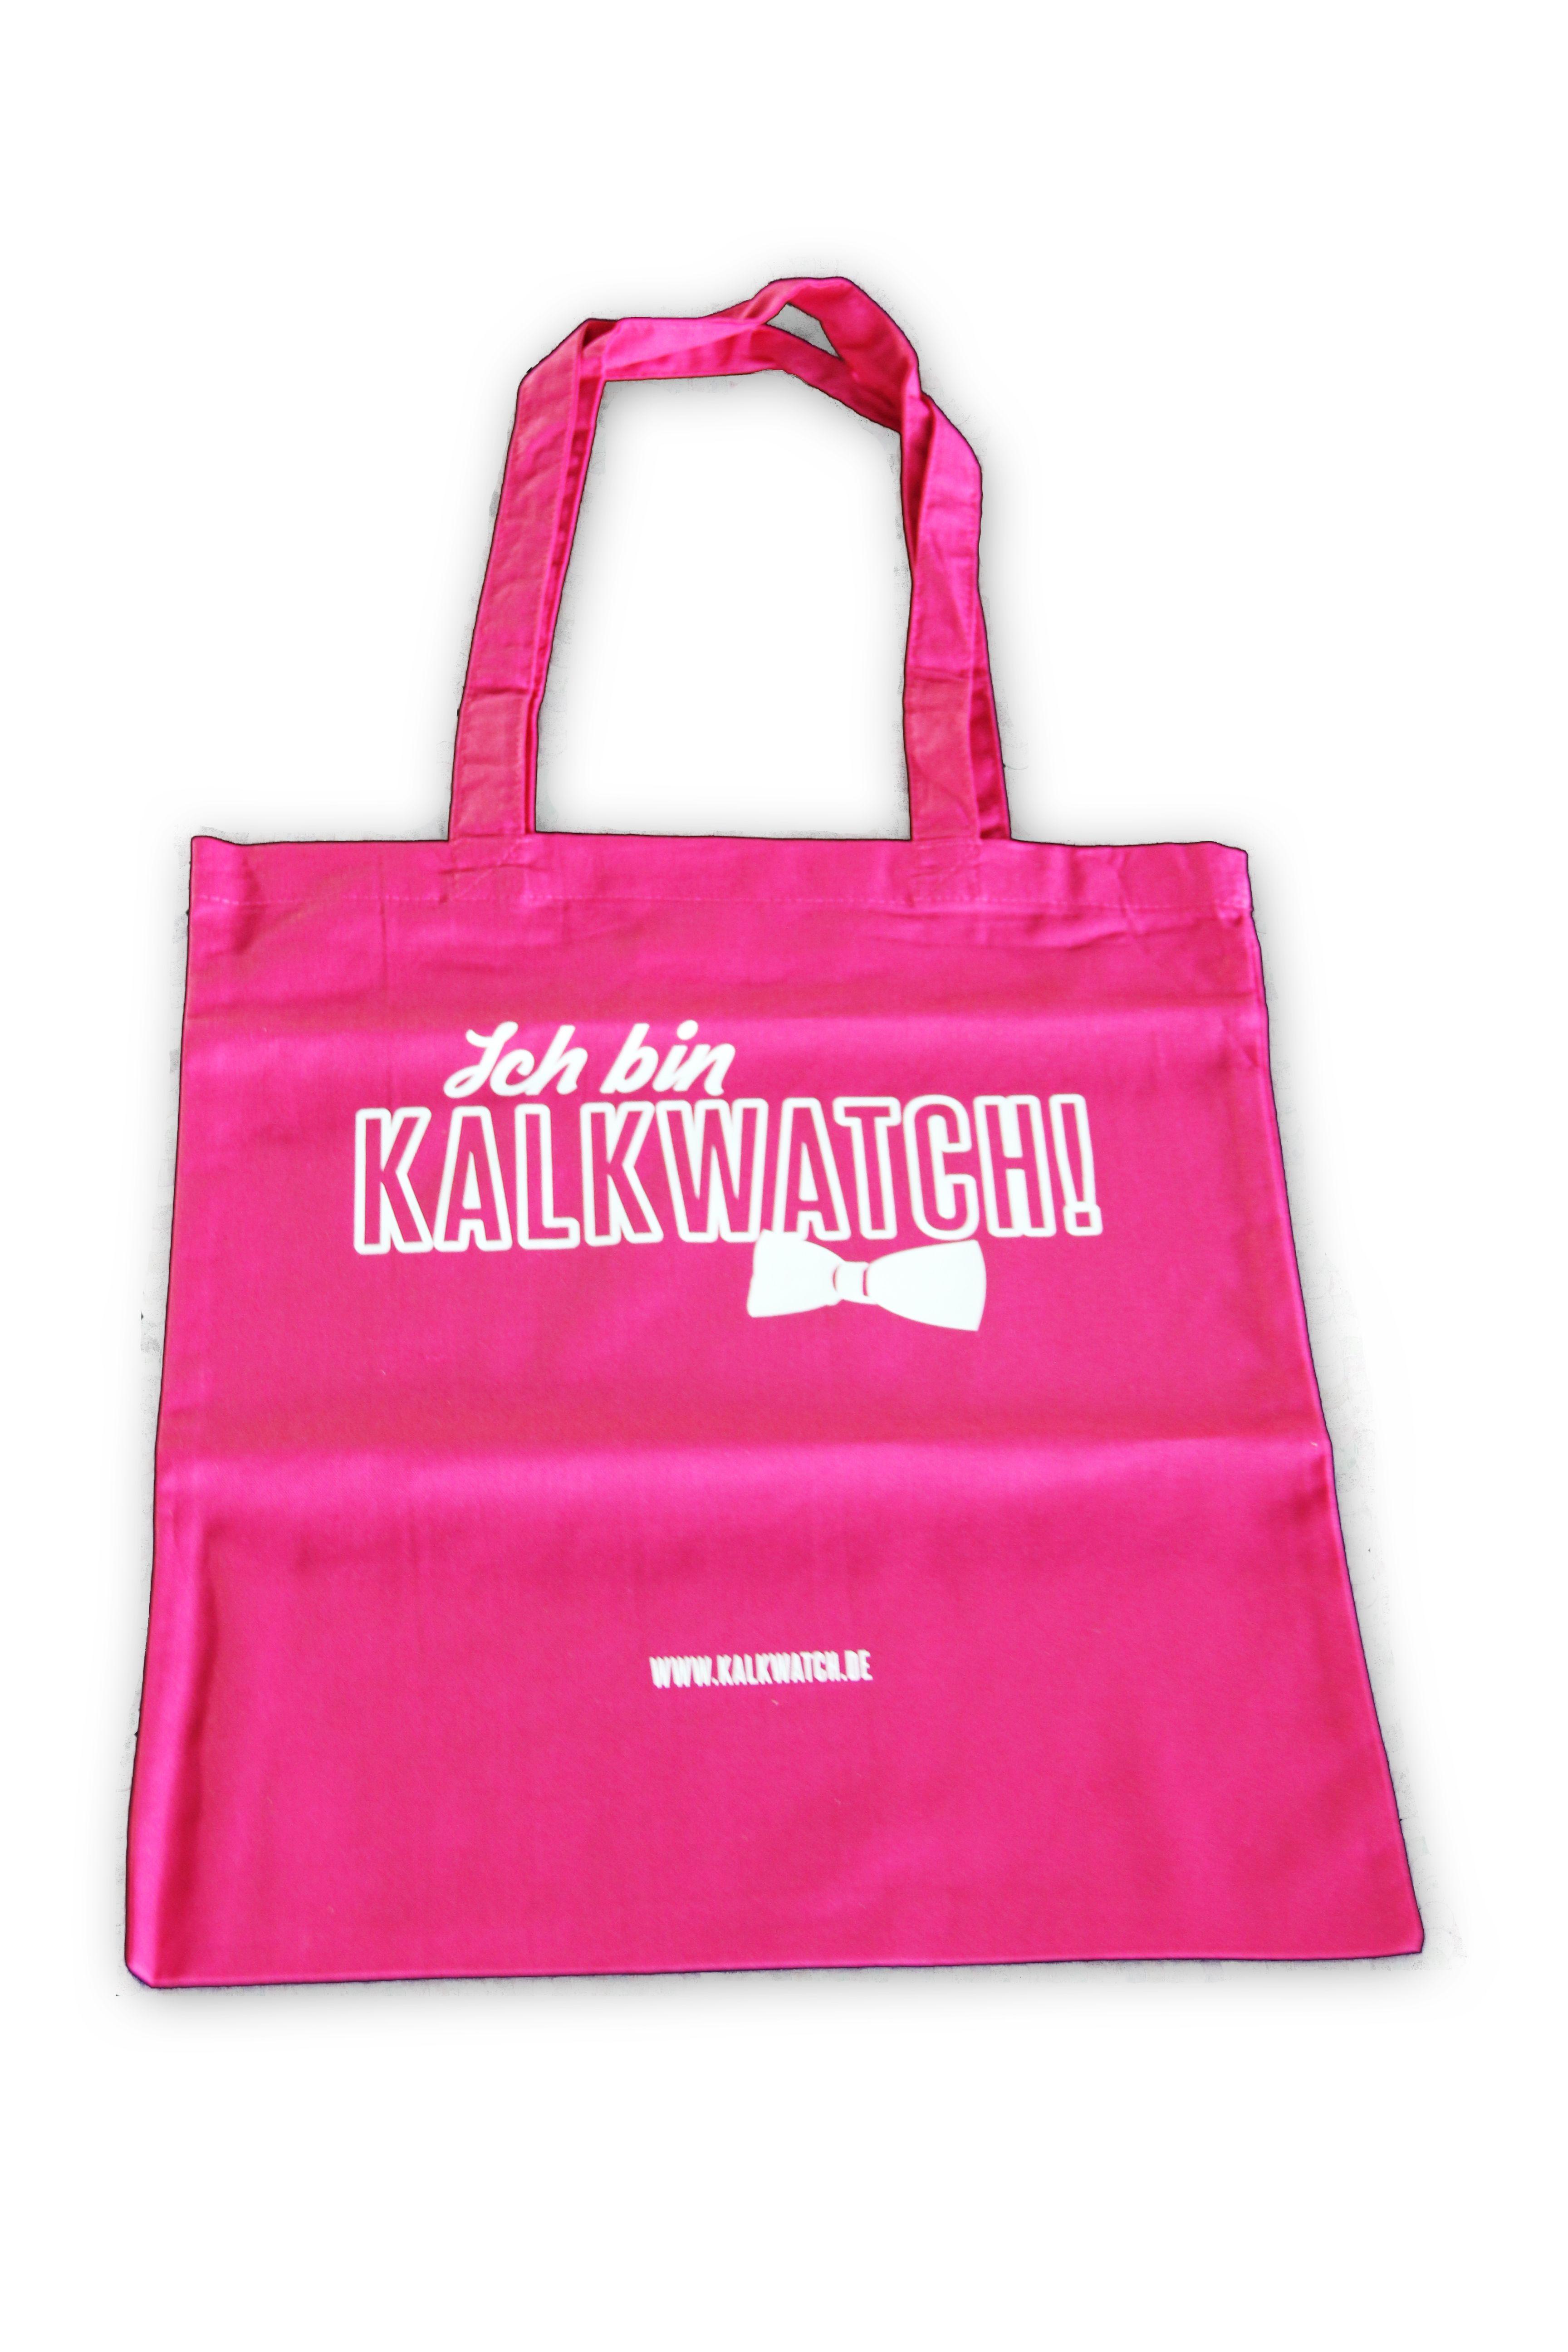 Kalkwatch